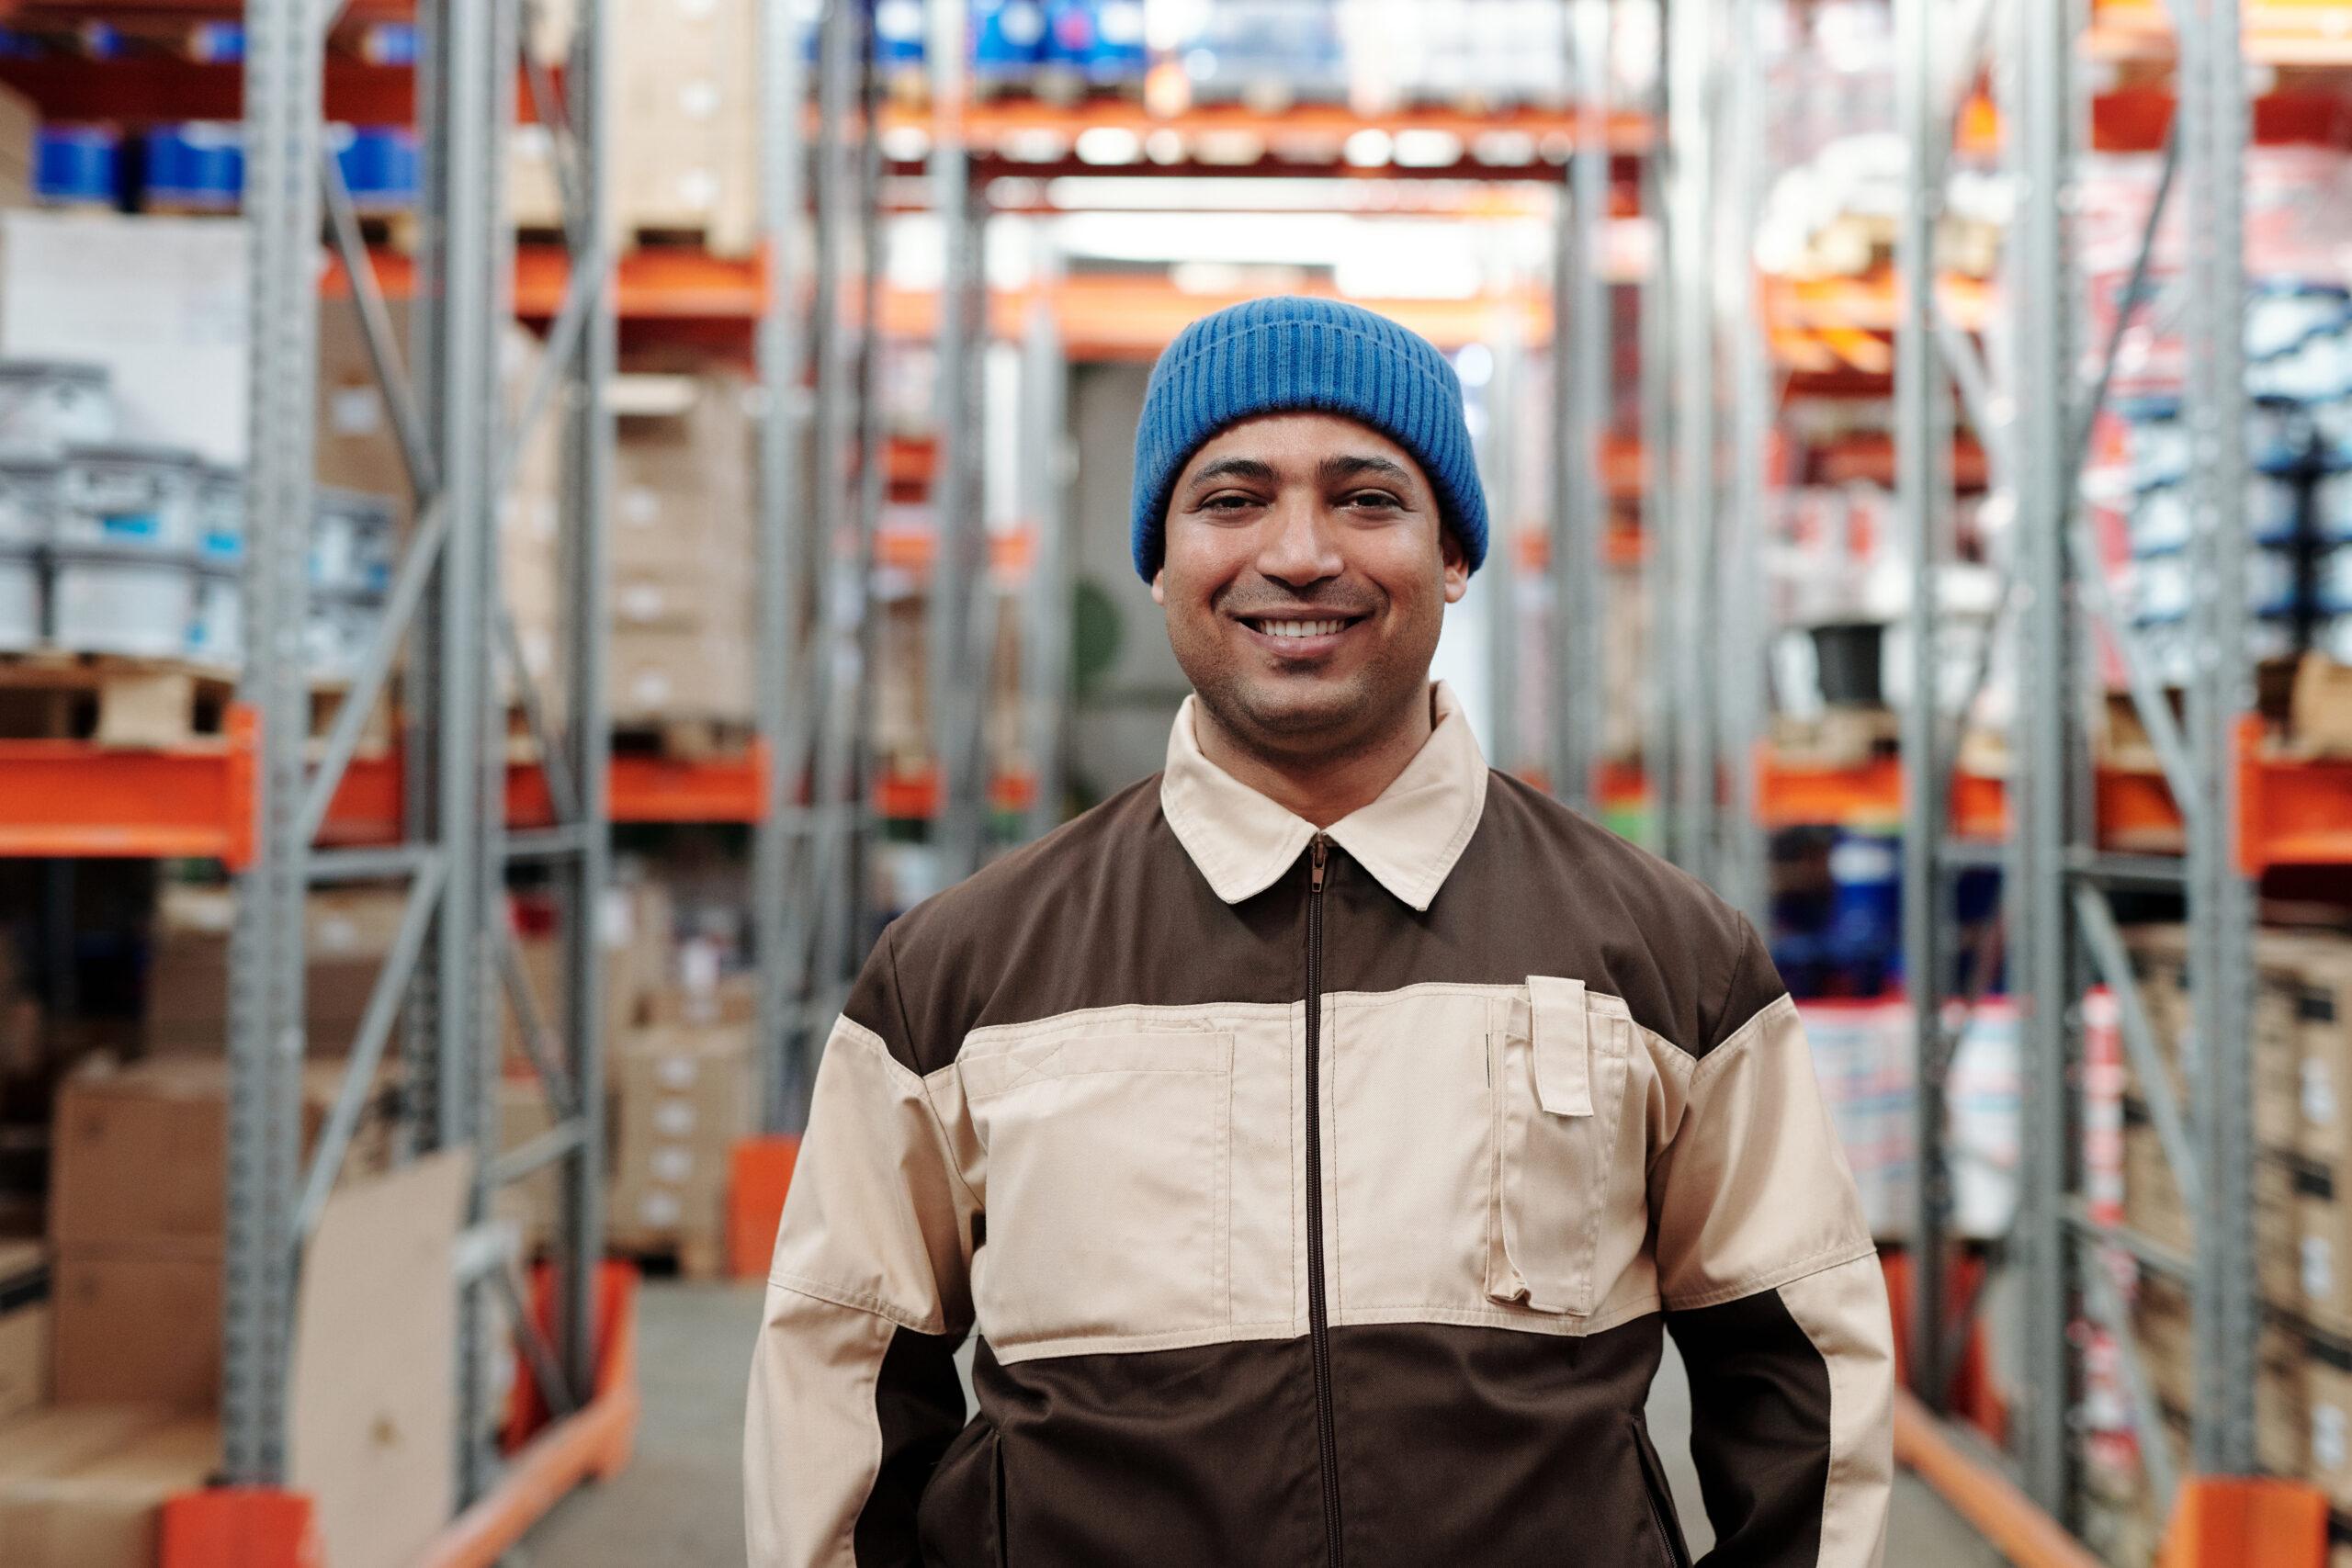 DLP - Worker's Compensation